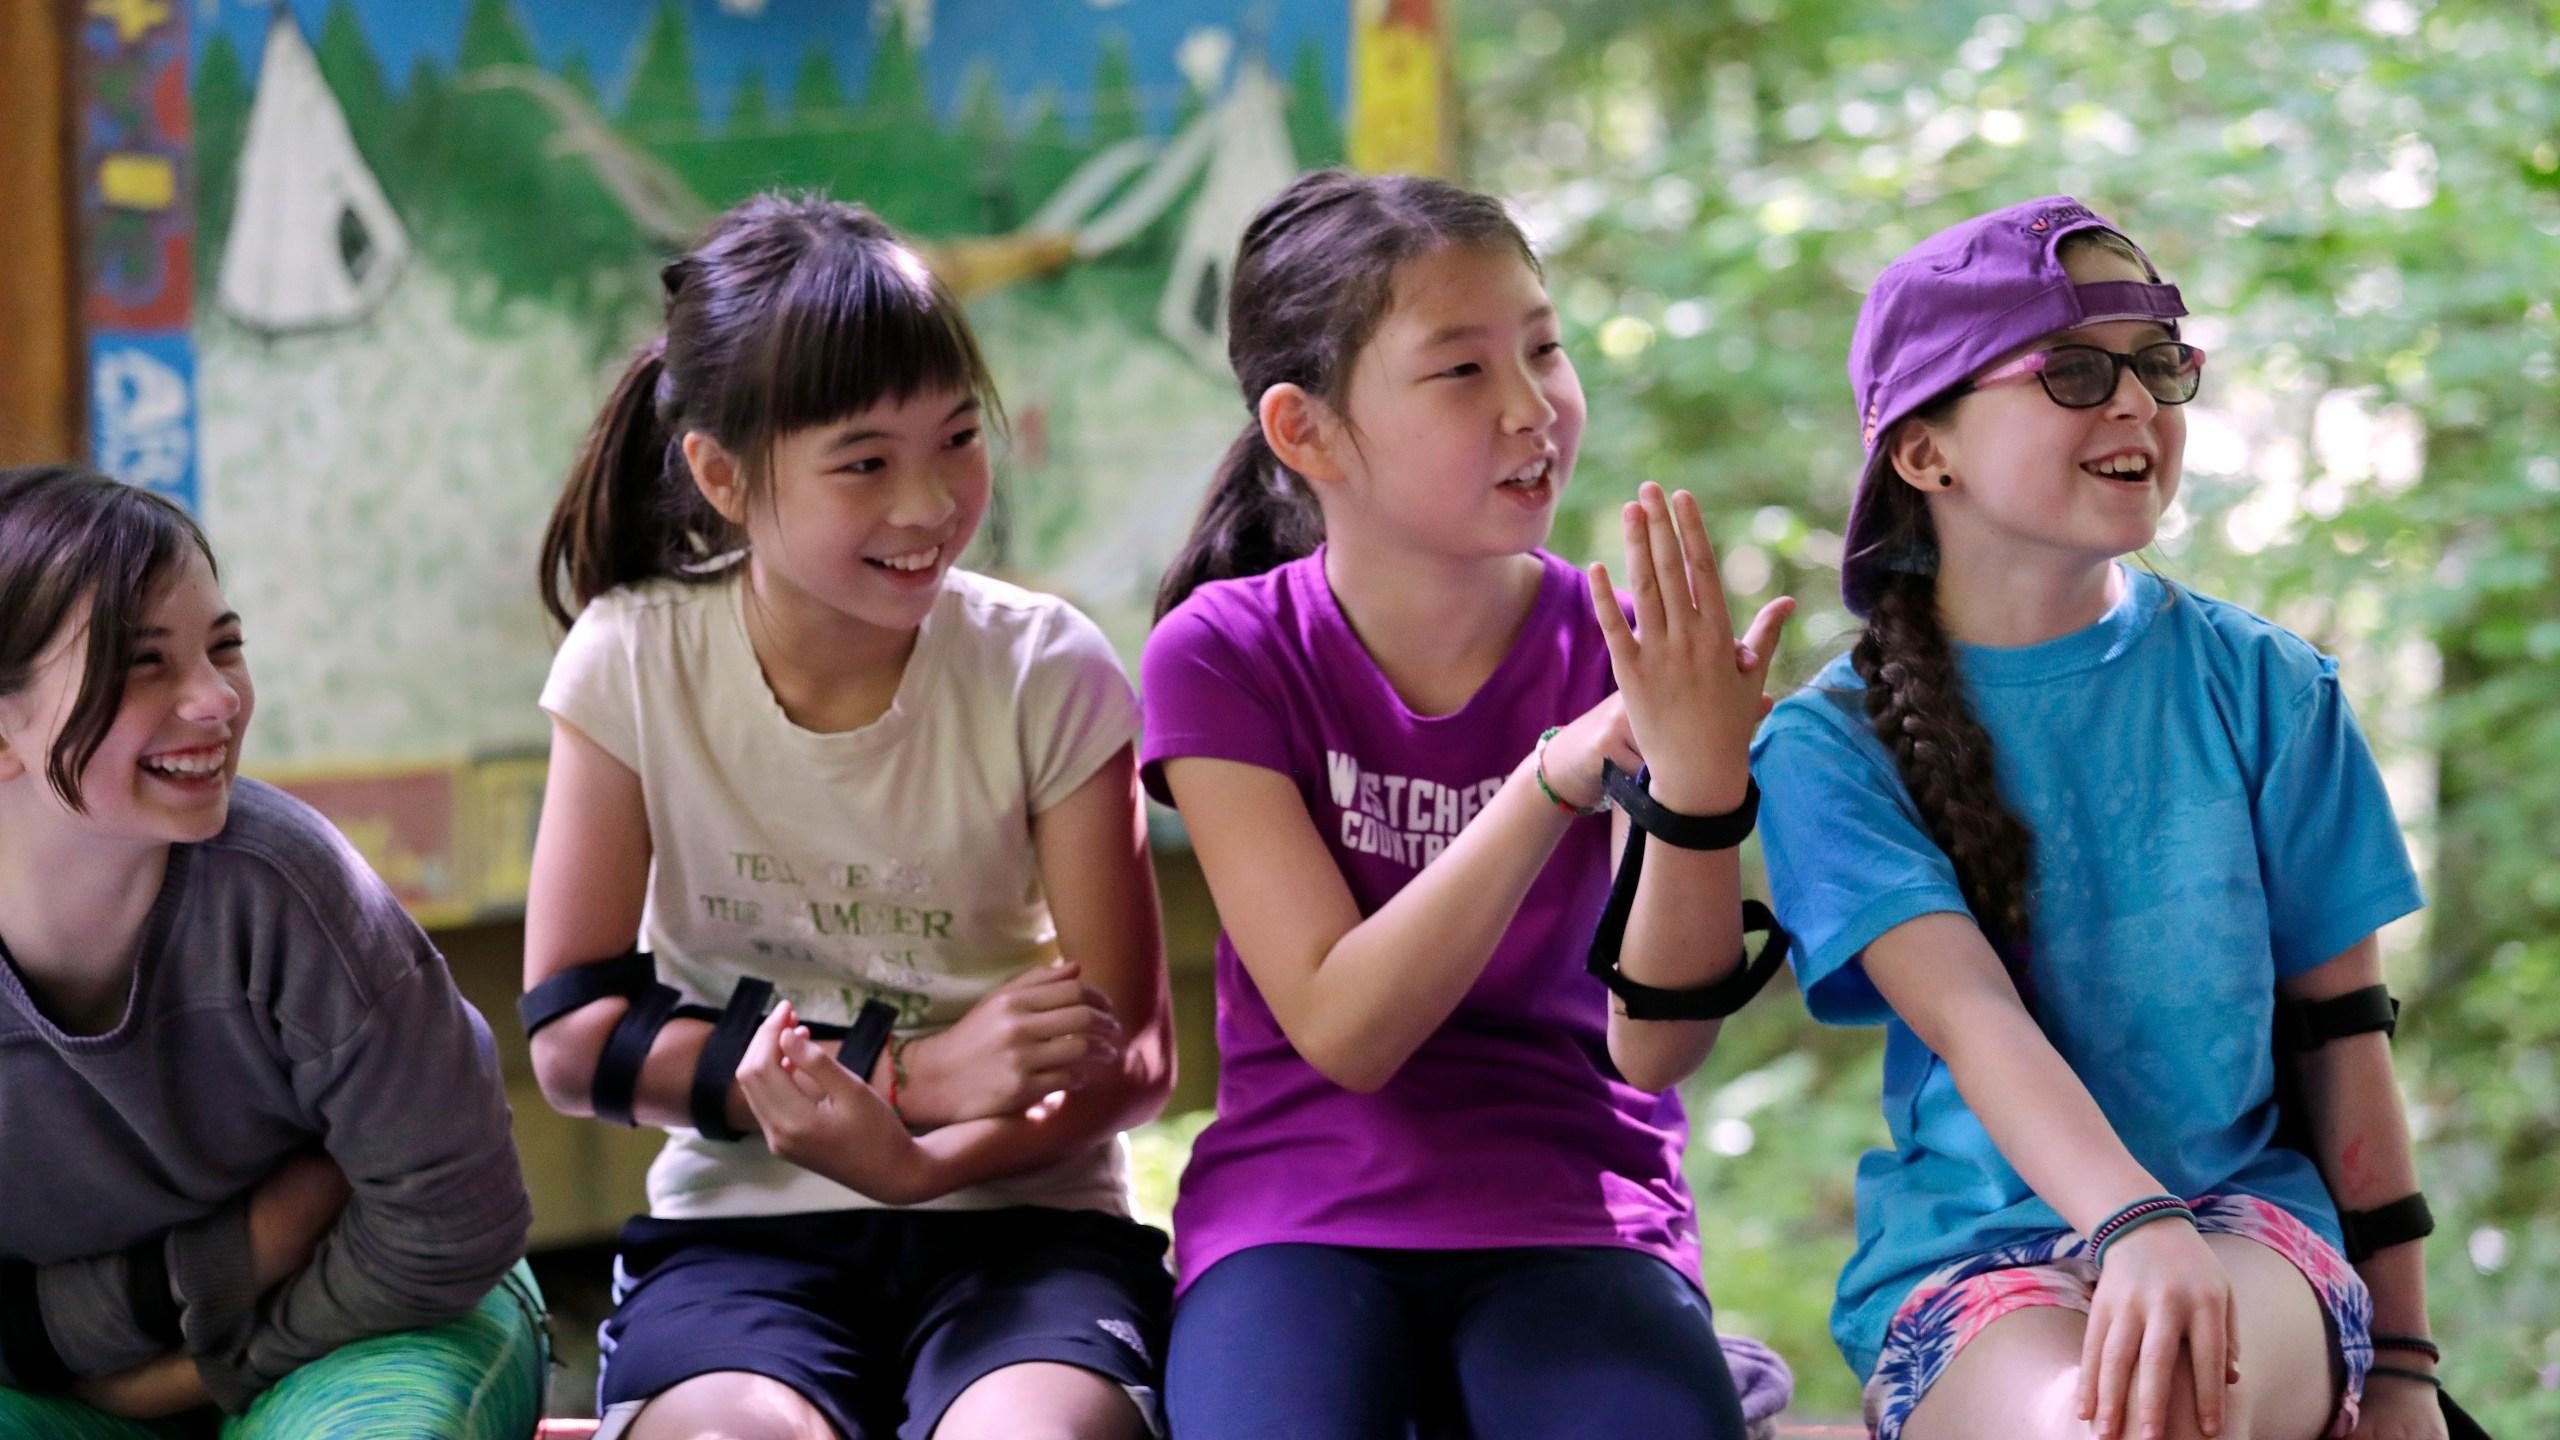 Girl_Scouts_Girl_Power_86010-159532.jpg11220430